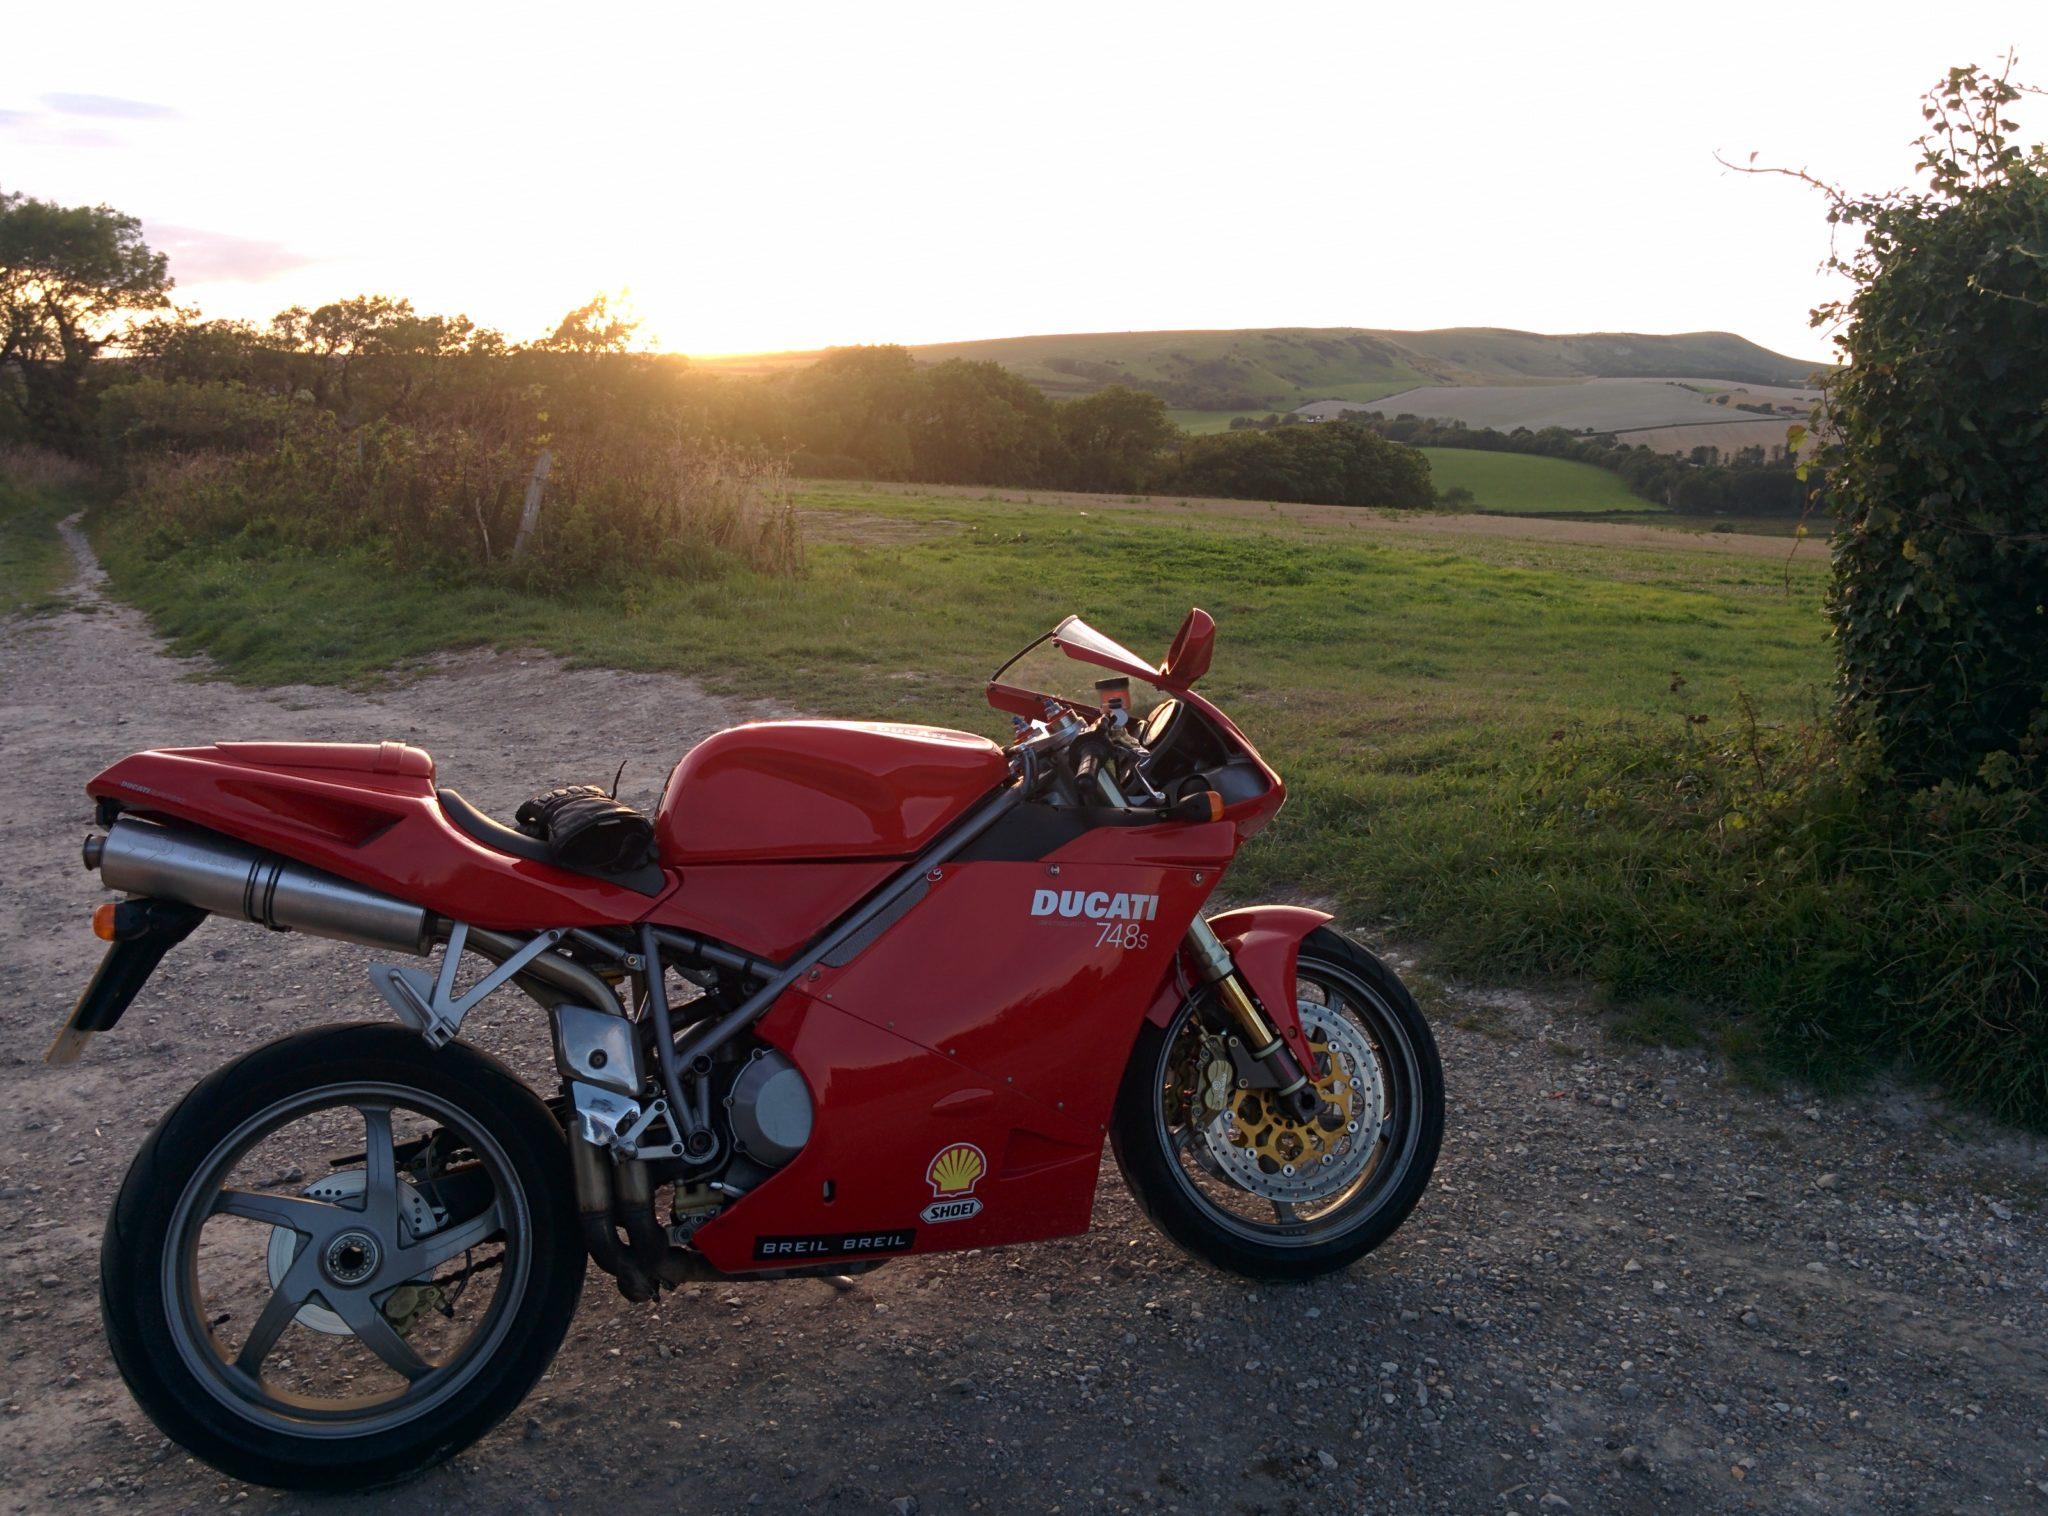 Simon – Ducati 748